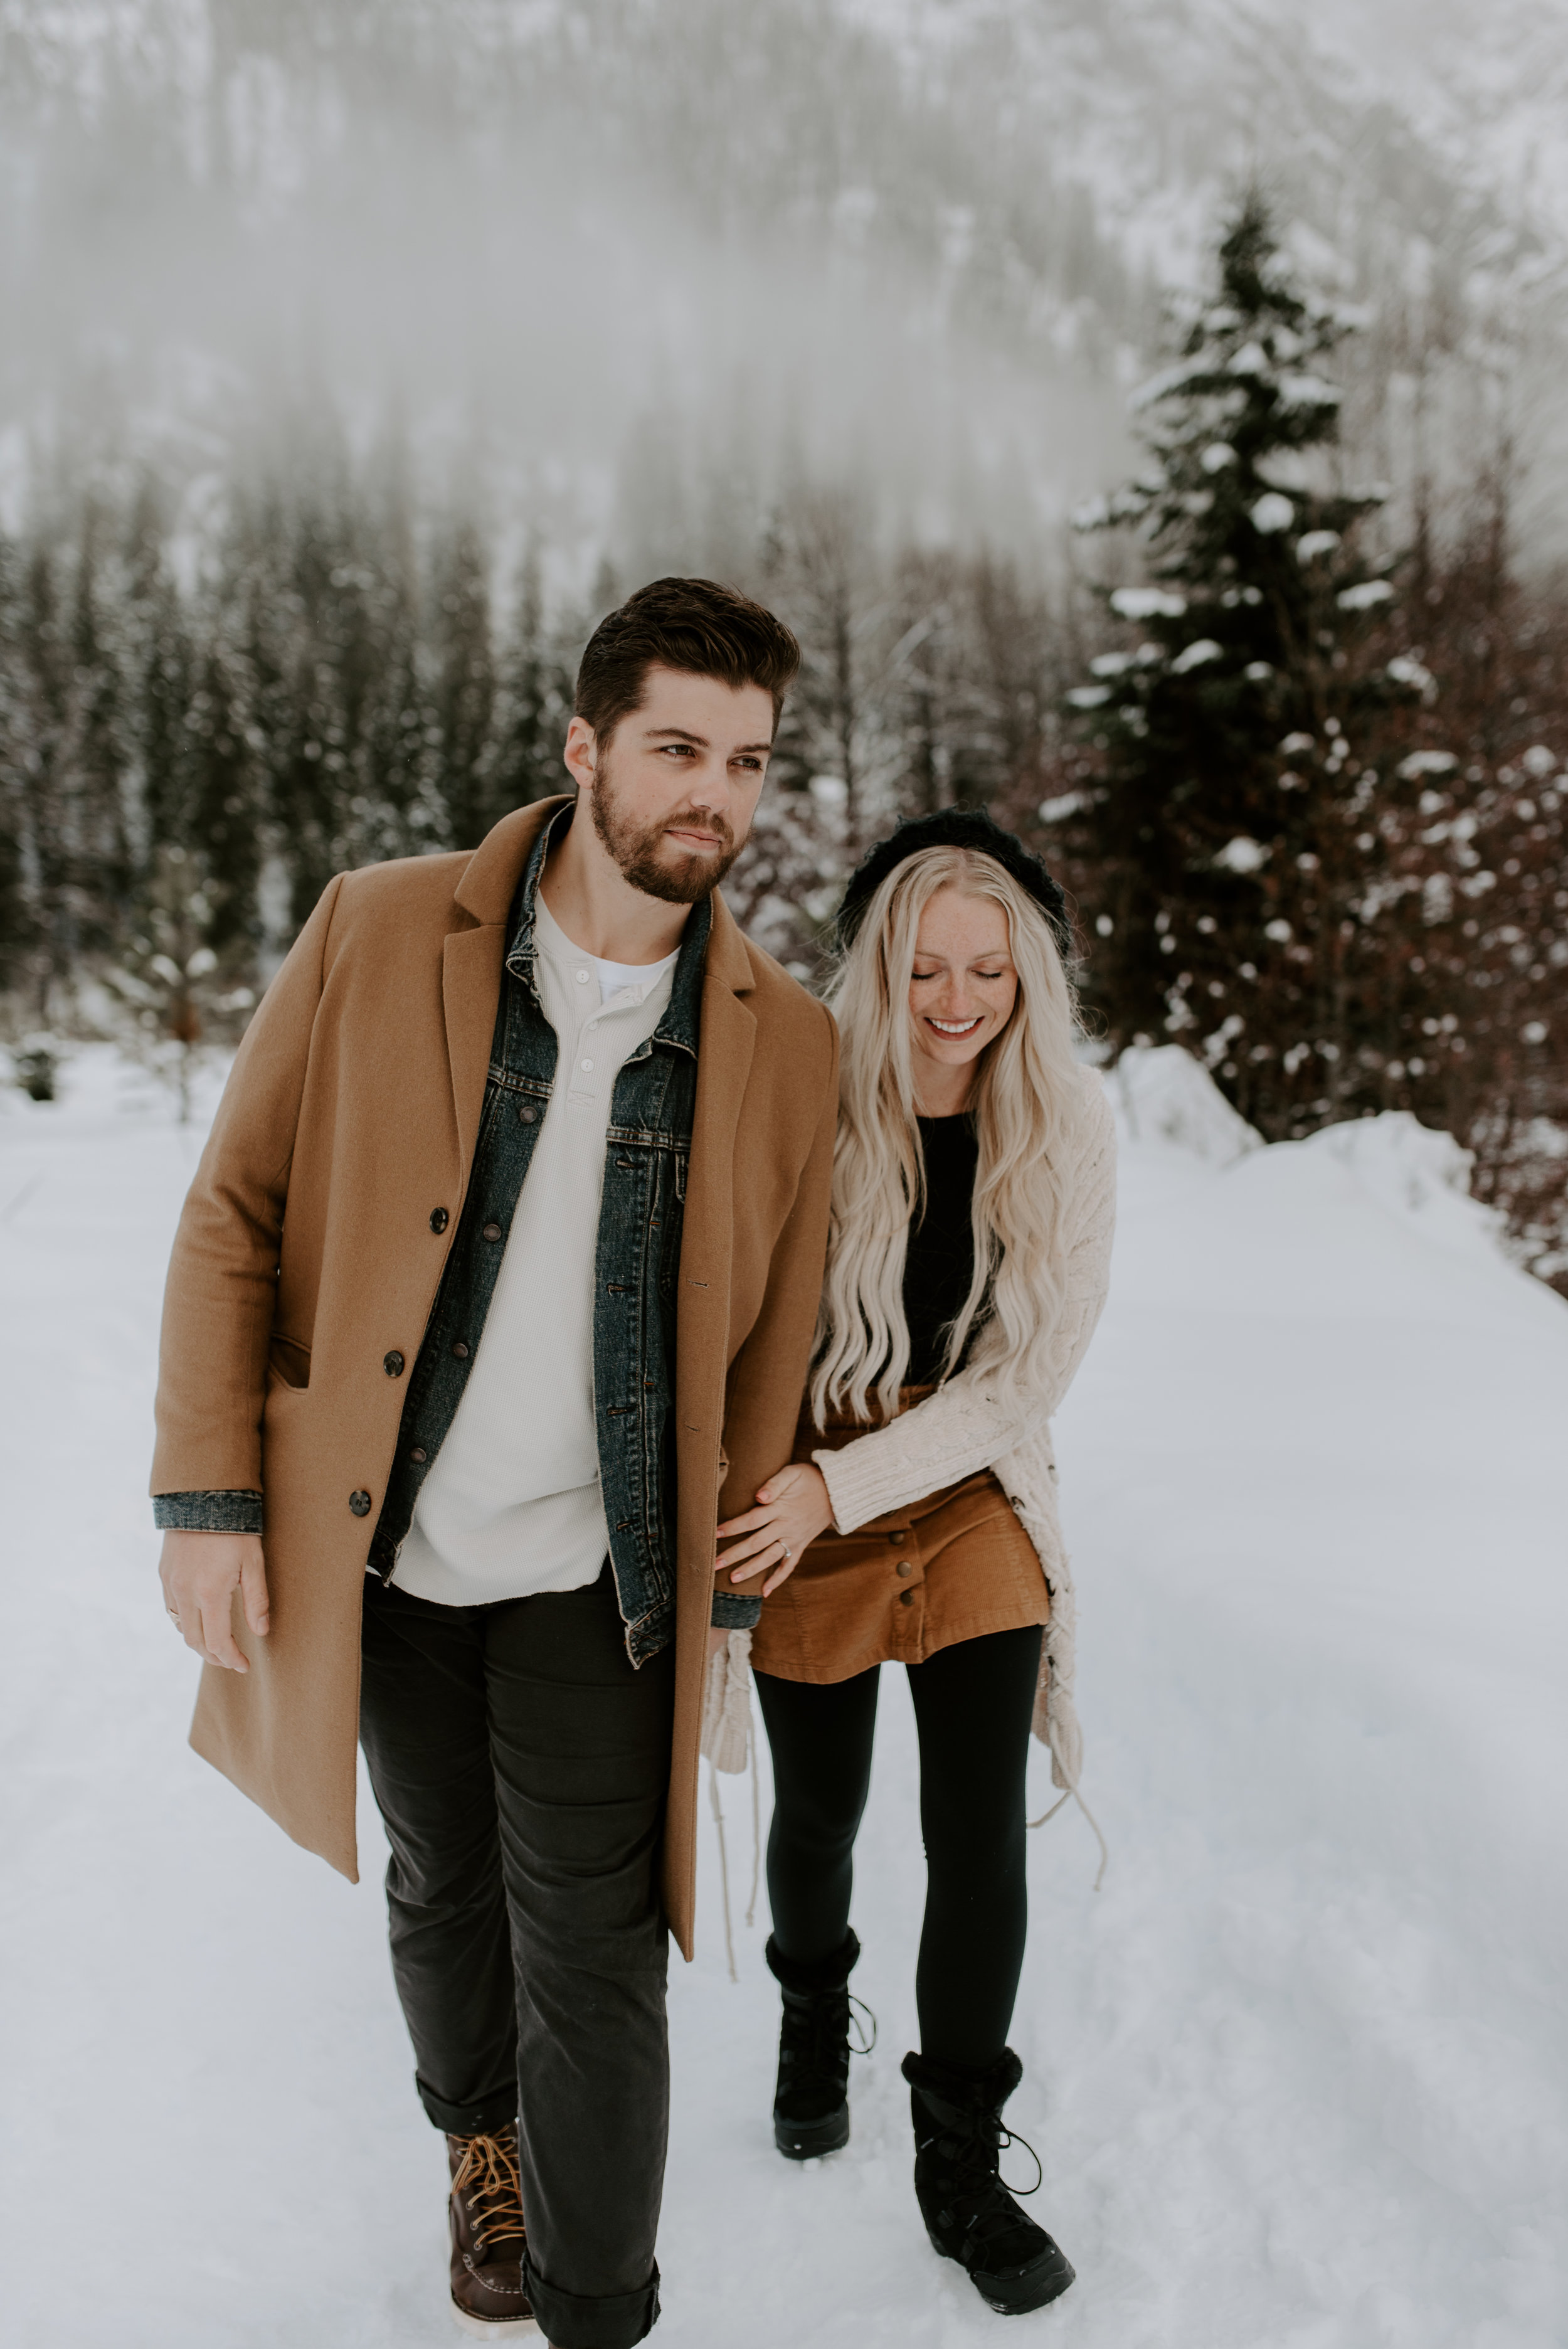 PNW adventure elopement photographer. Winter session in Leavenworth.